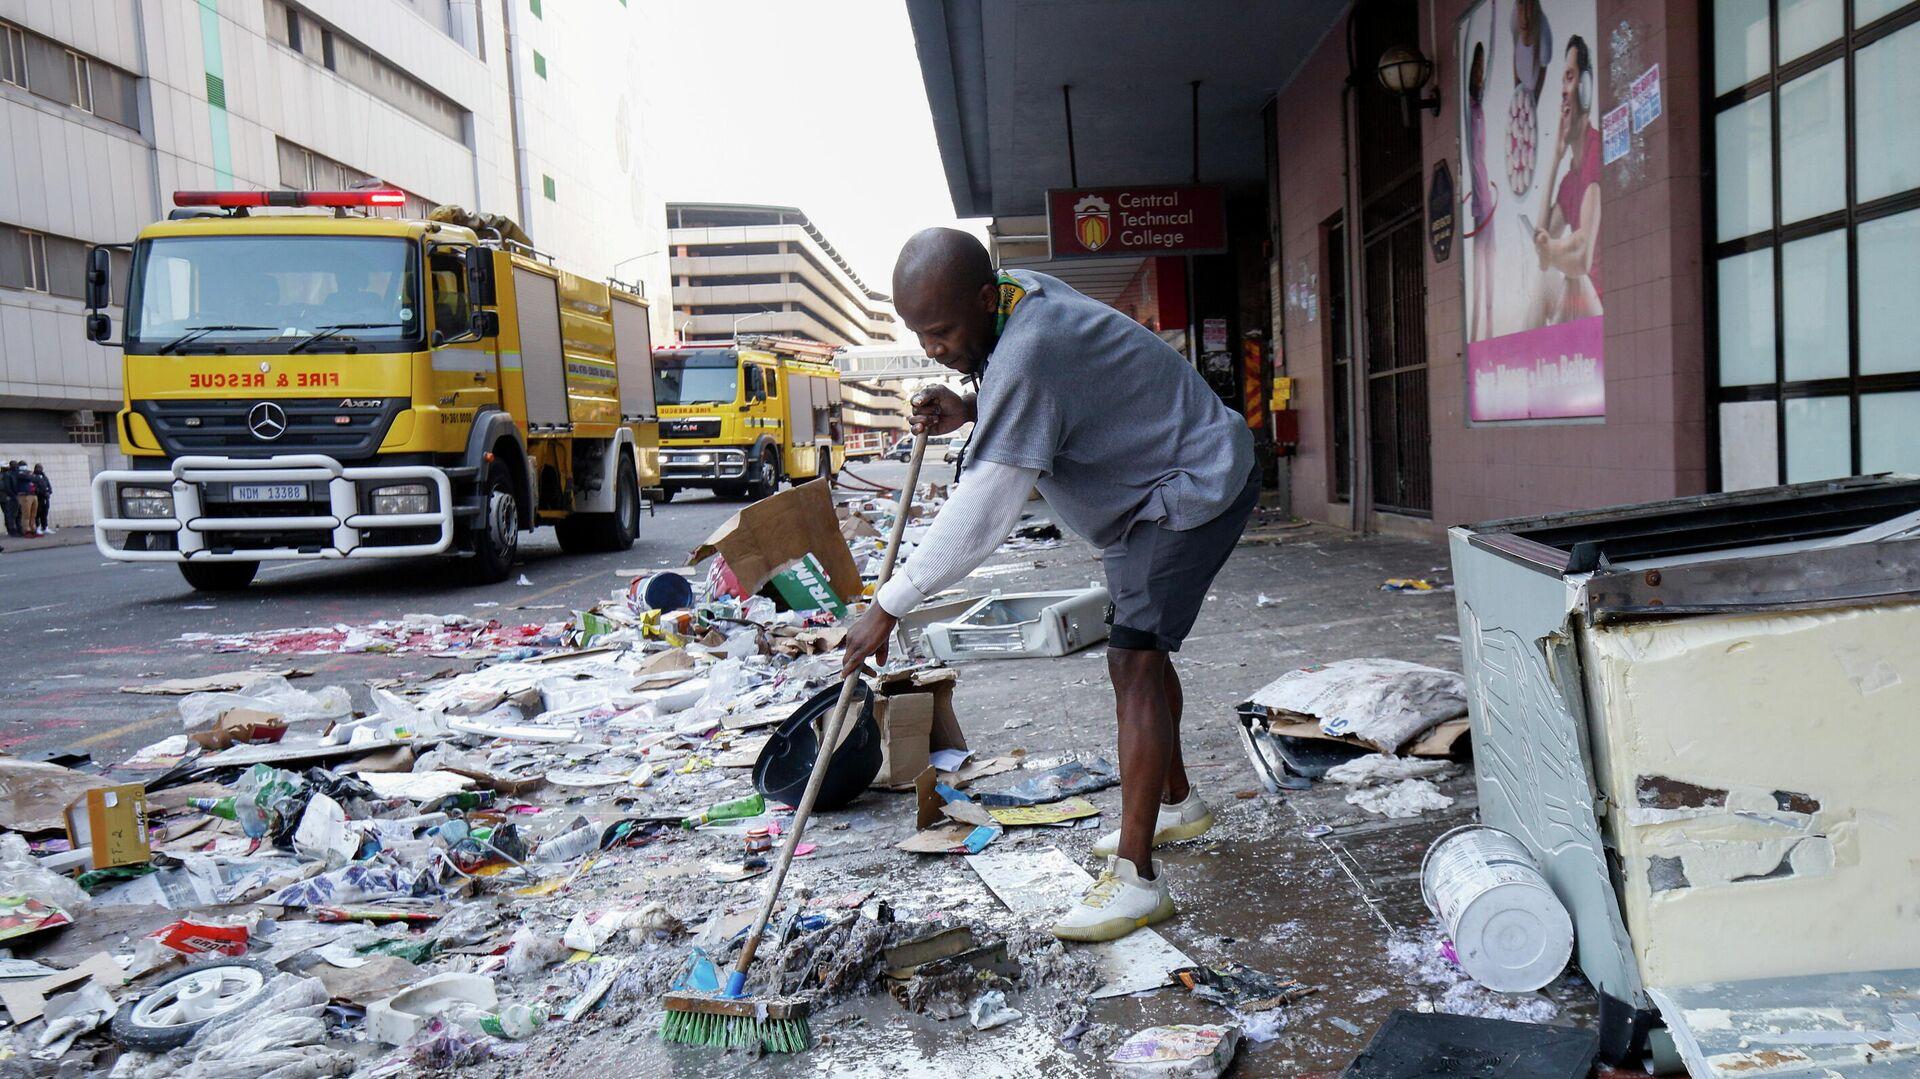 Folgen schwerer Ausschreitungen in Durban, Südafrika, 15. Juli 2021 - SNA, 1920, 15.07.2021